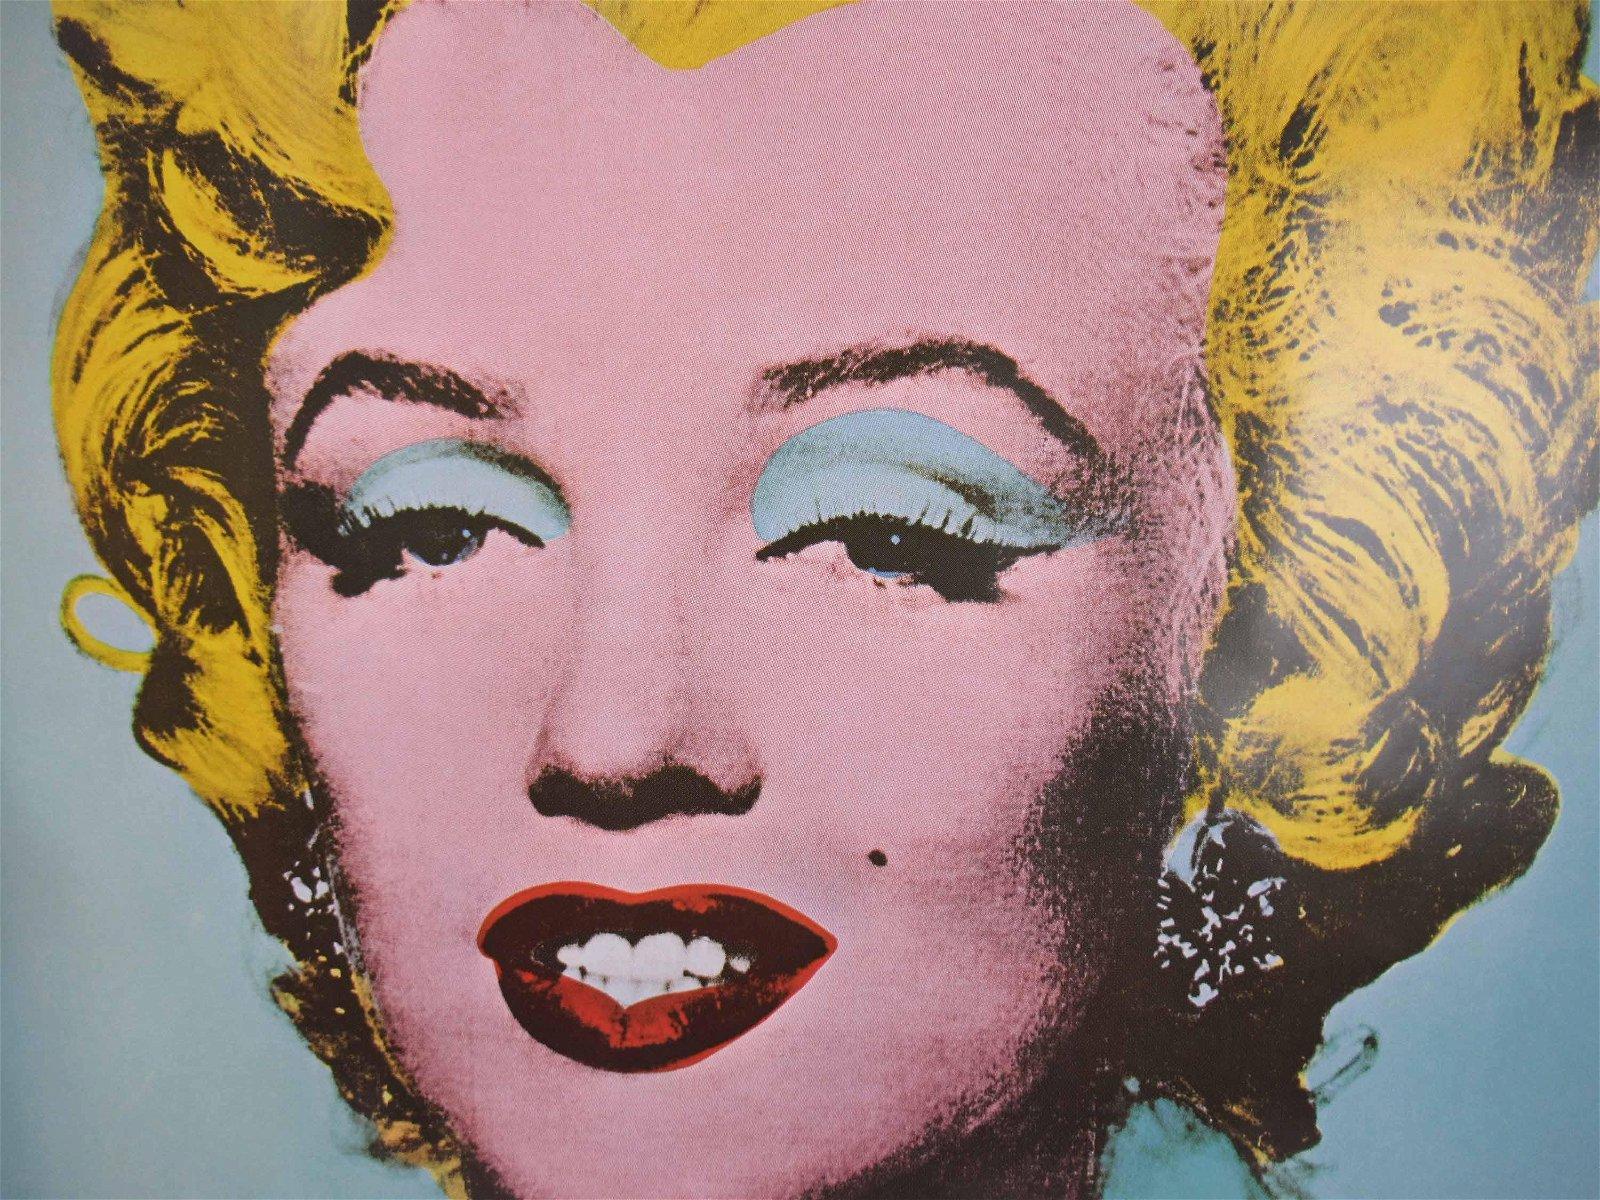 Andy Warhol Marilyn Monroe Tate Gallery Poster